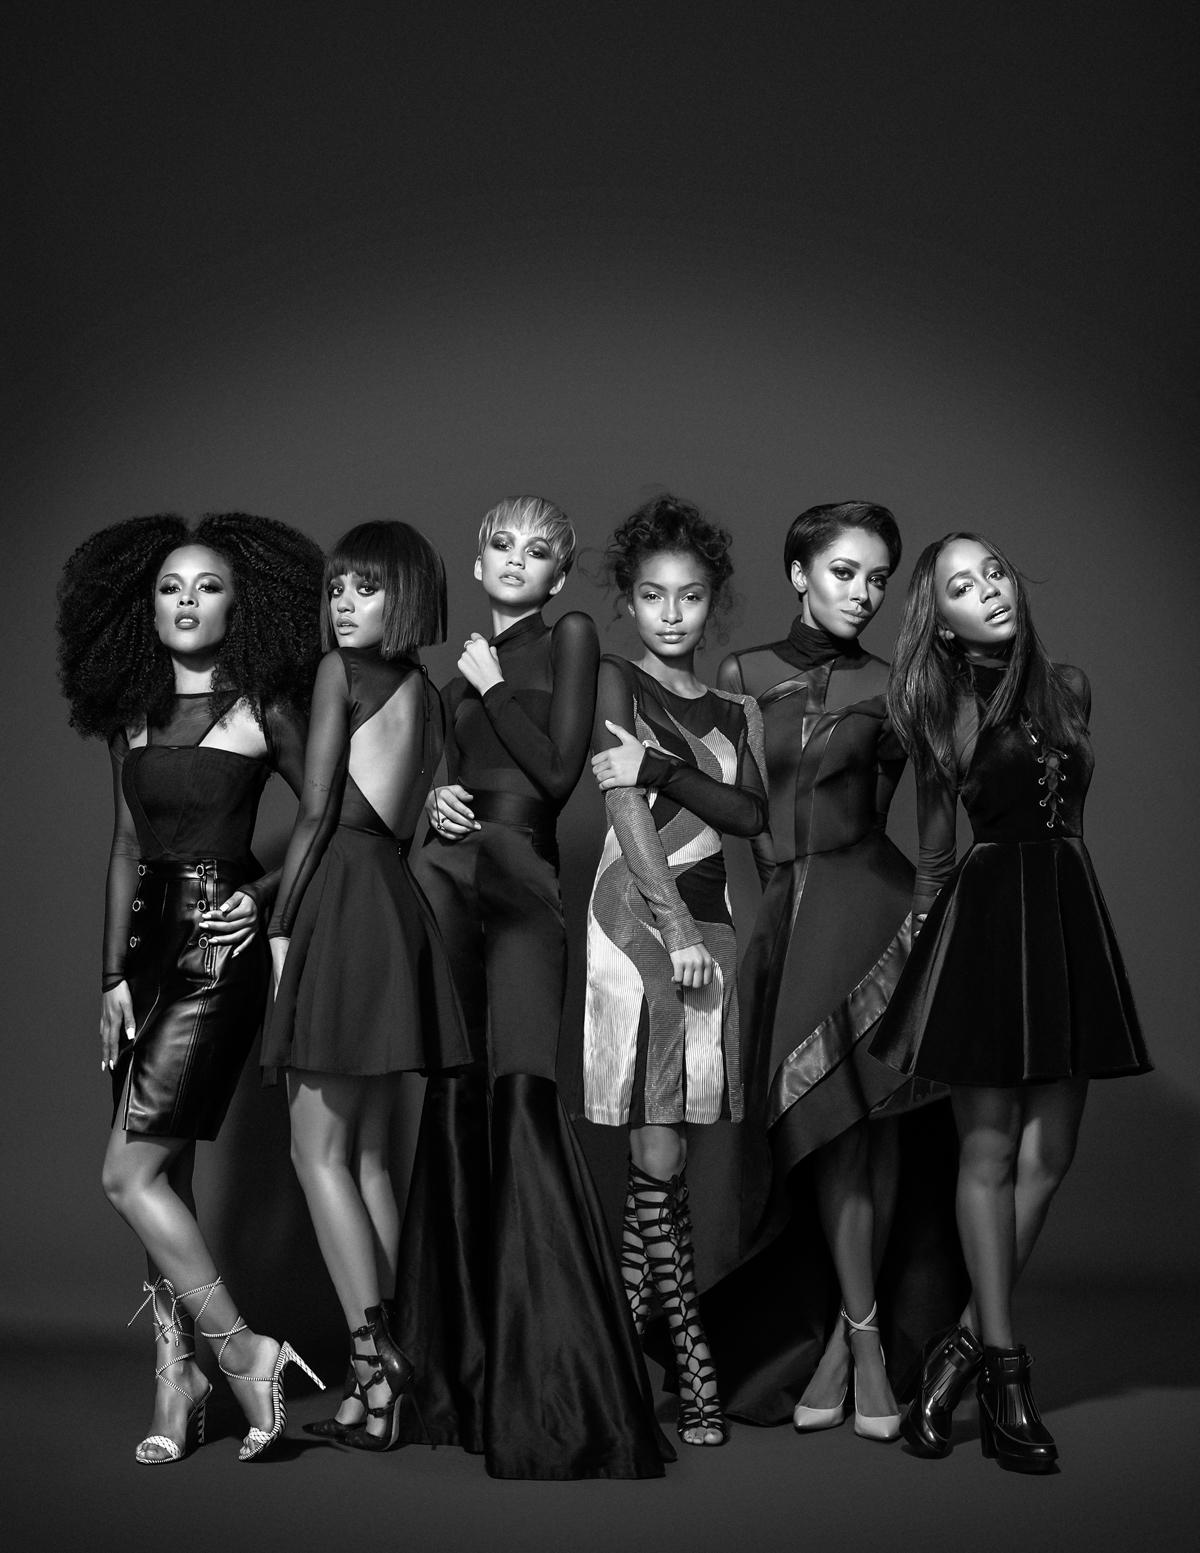 #GenerationNoir for Kode Magazine Photographed by Bradford Rogne | Featuring Serayah, Kiersey Clemons, Zendaya, Yara Shahid, Kat Graham and Aja Naomi King